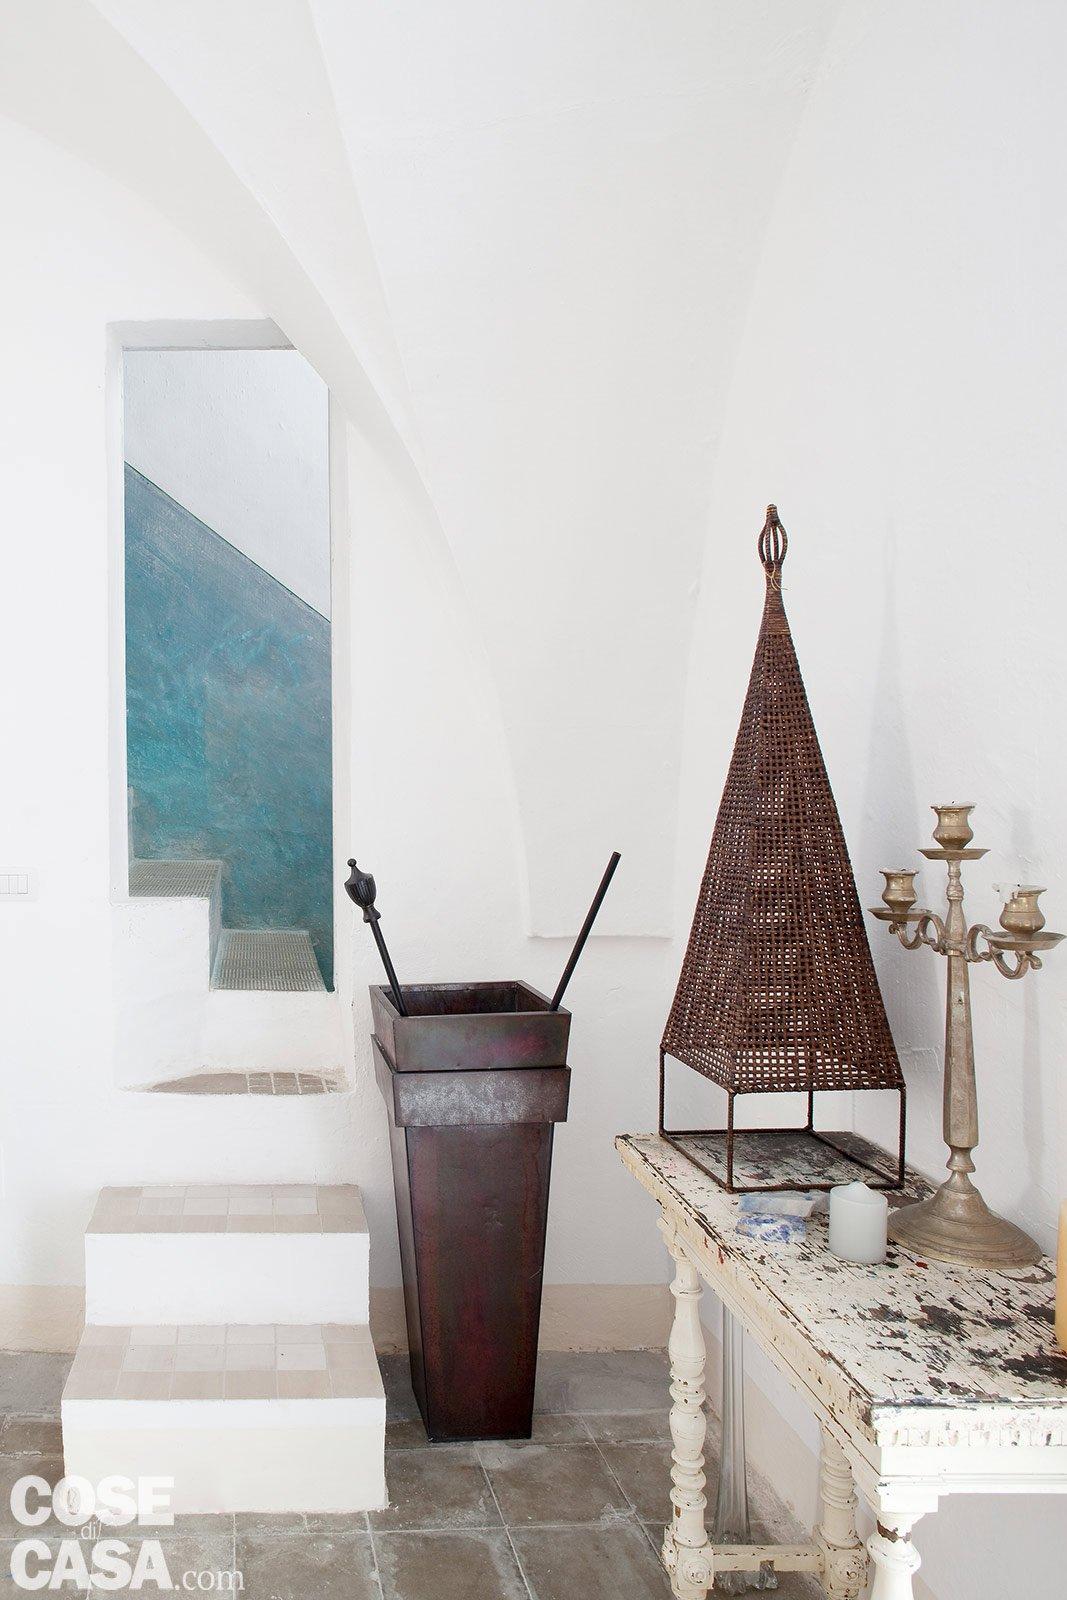 Una casa in pietra in stile mediterraneo cose di casa for Foto di case